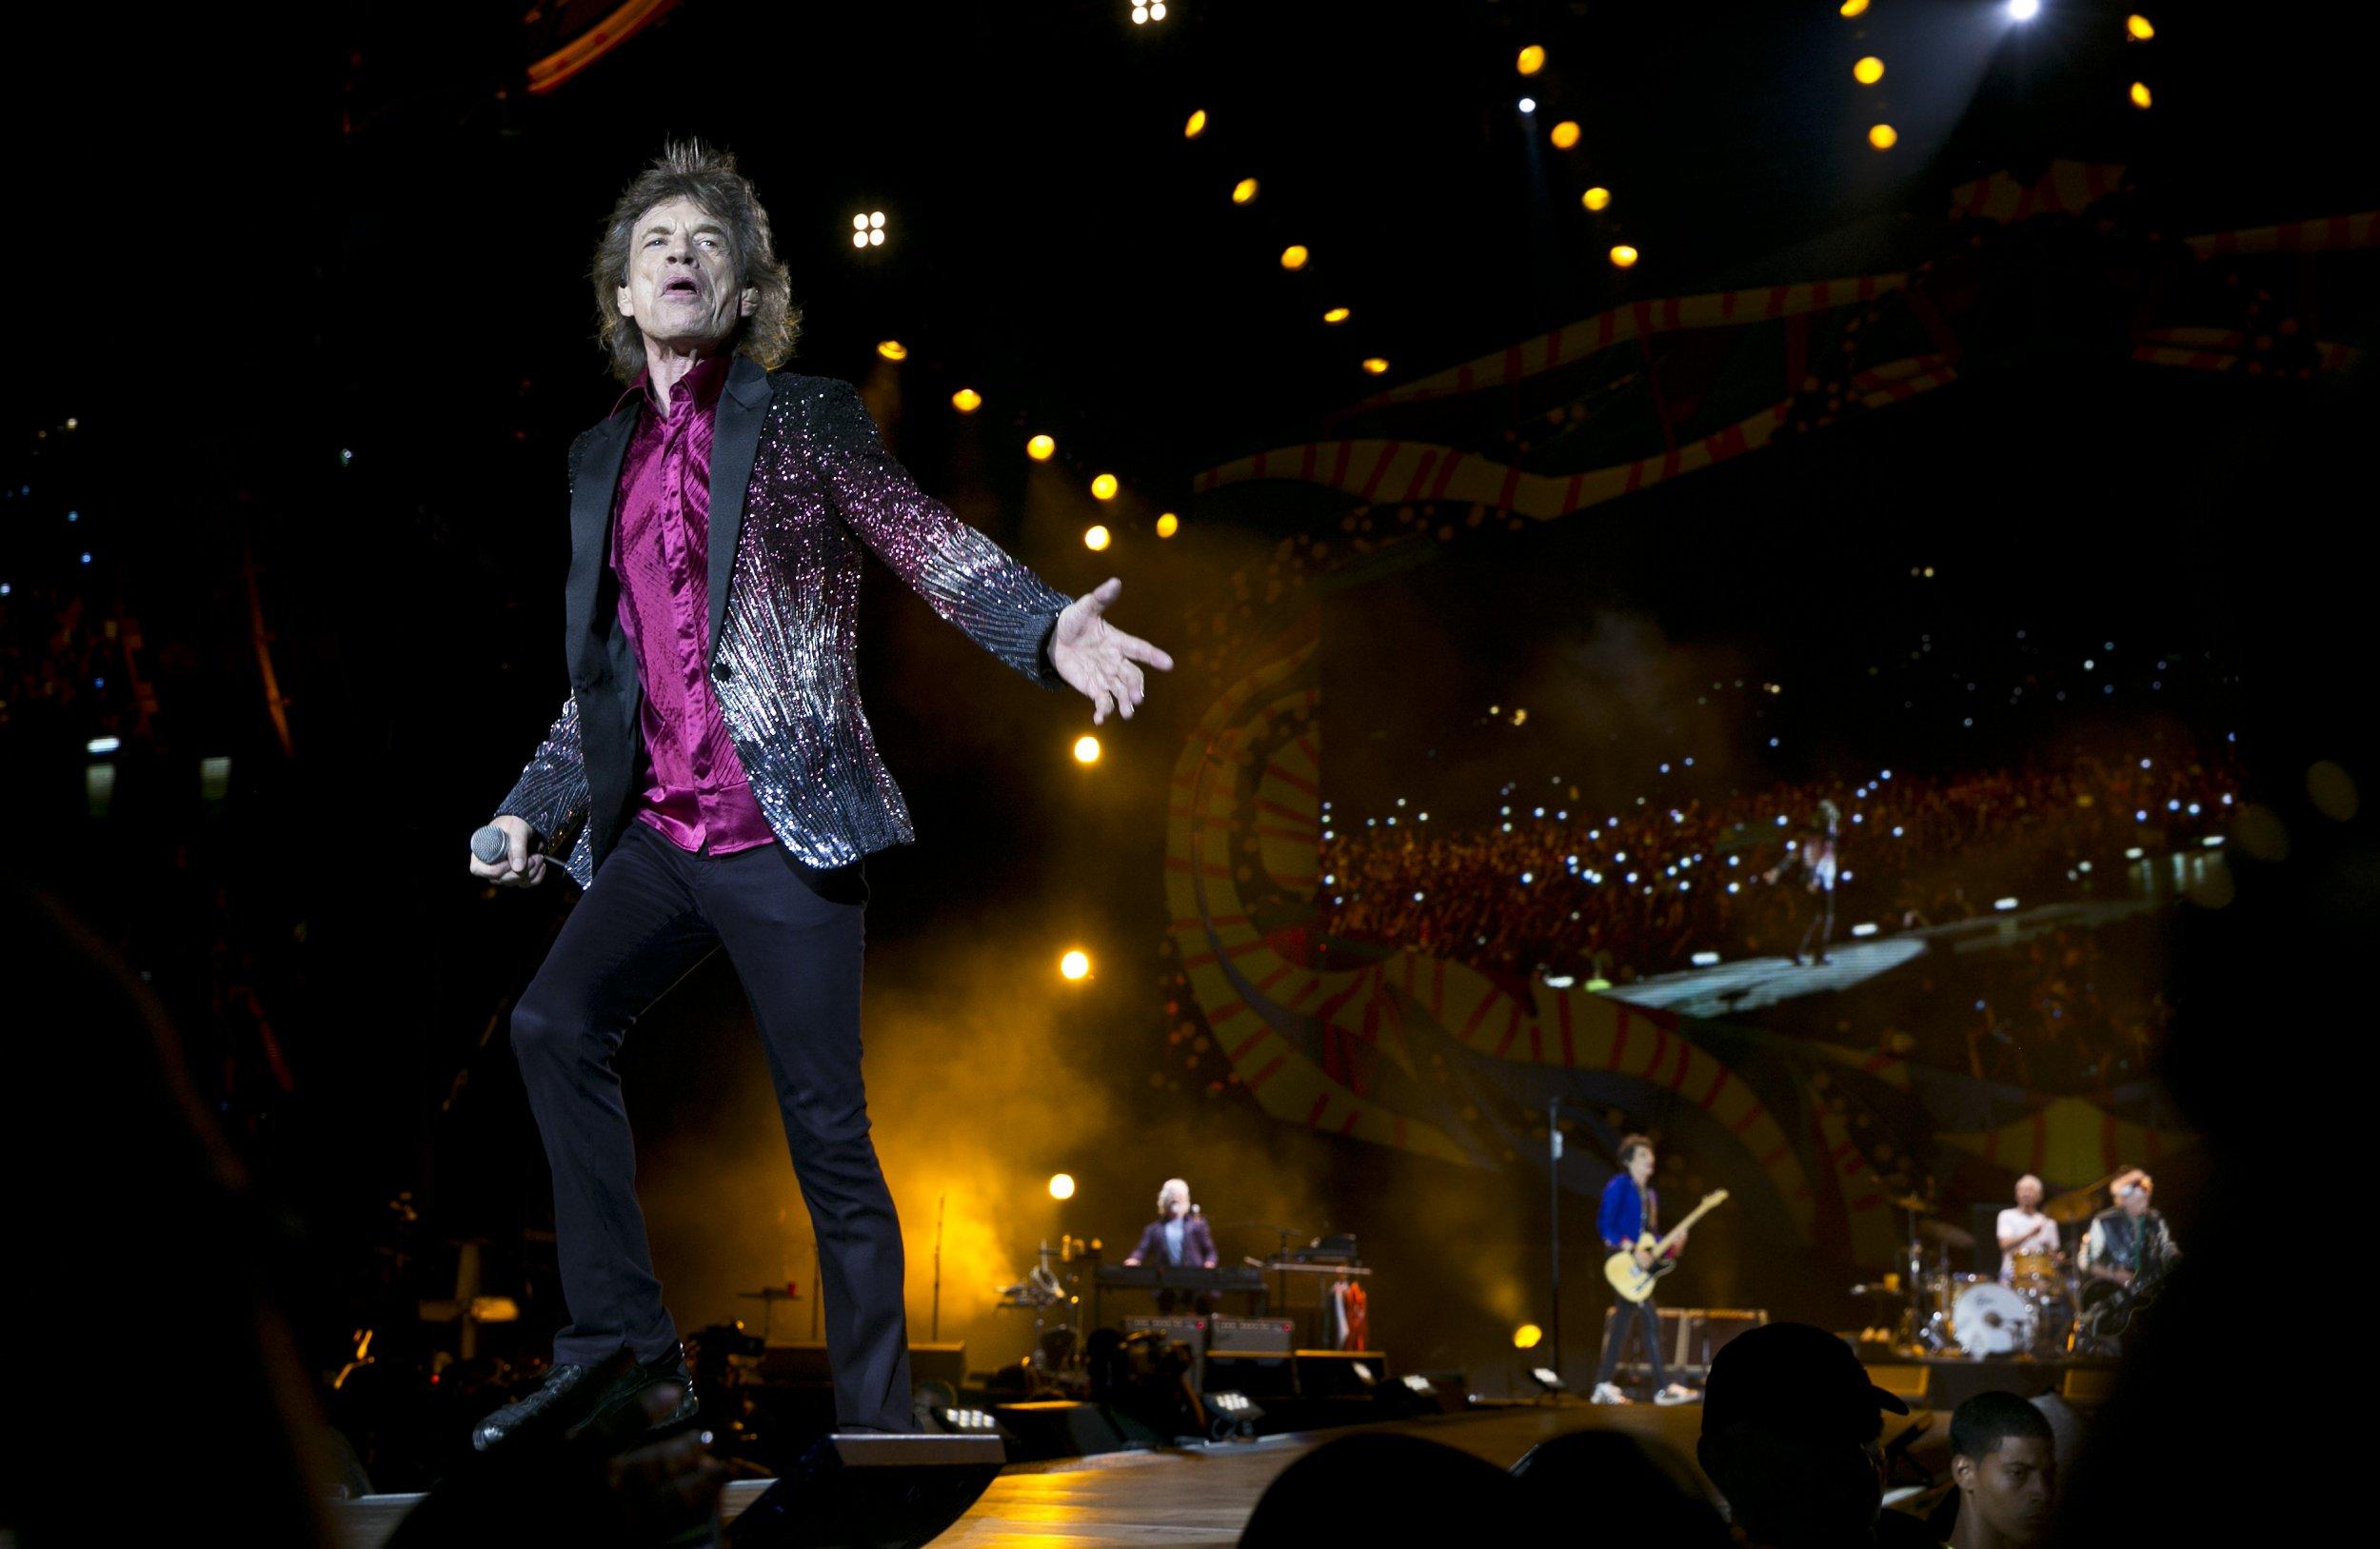 WATCH: New trailer for The Rolling Stones concert film Havana Moon looks suitably epic